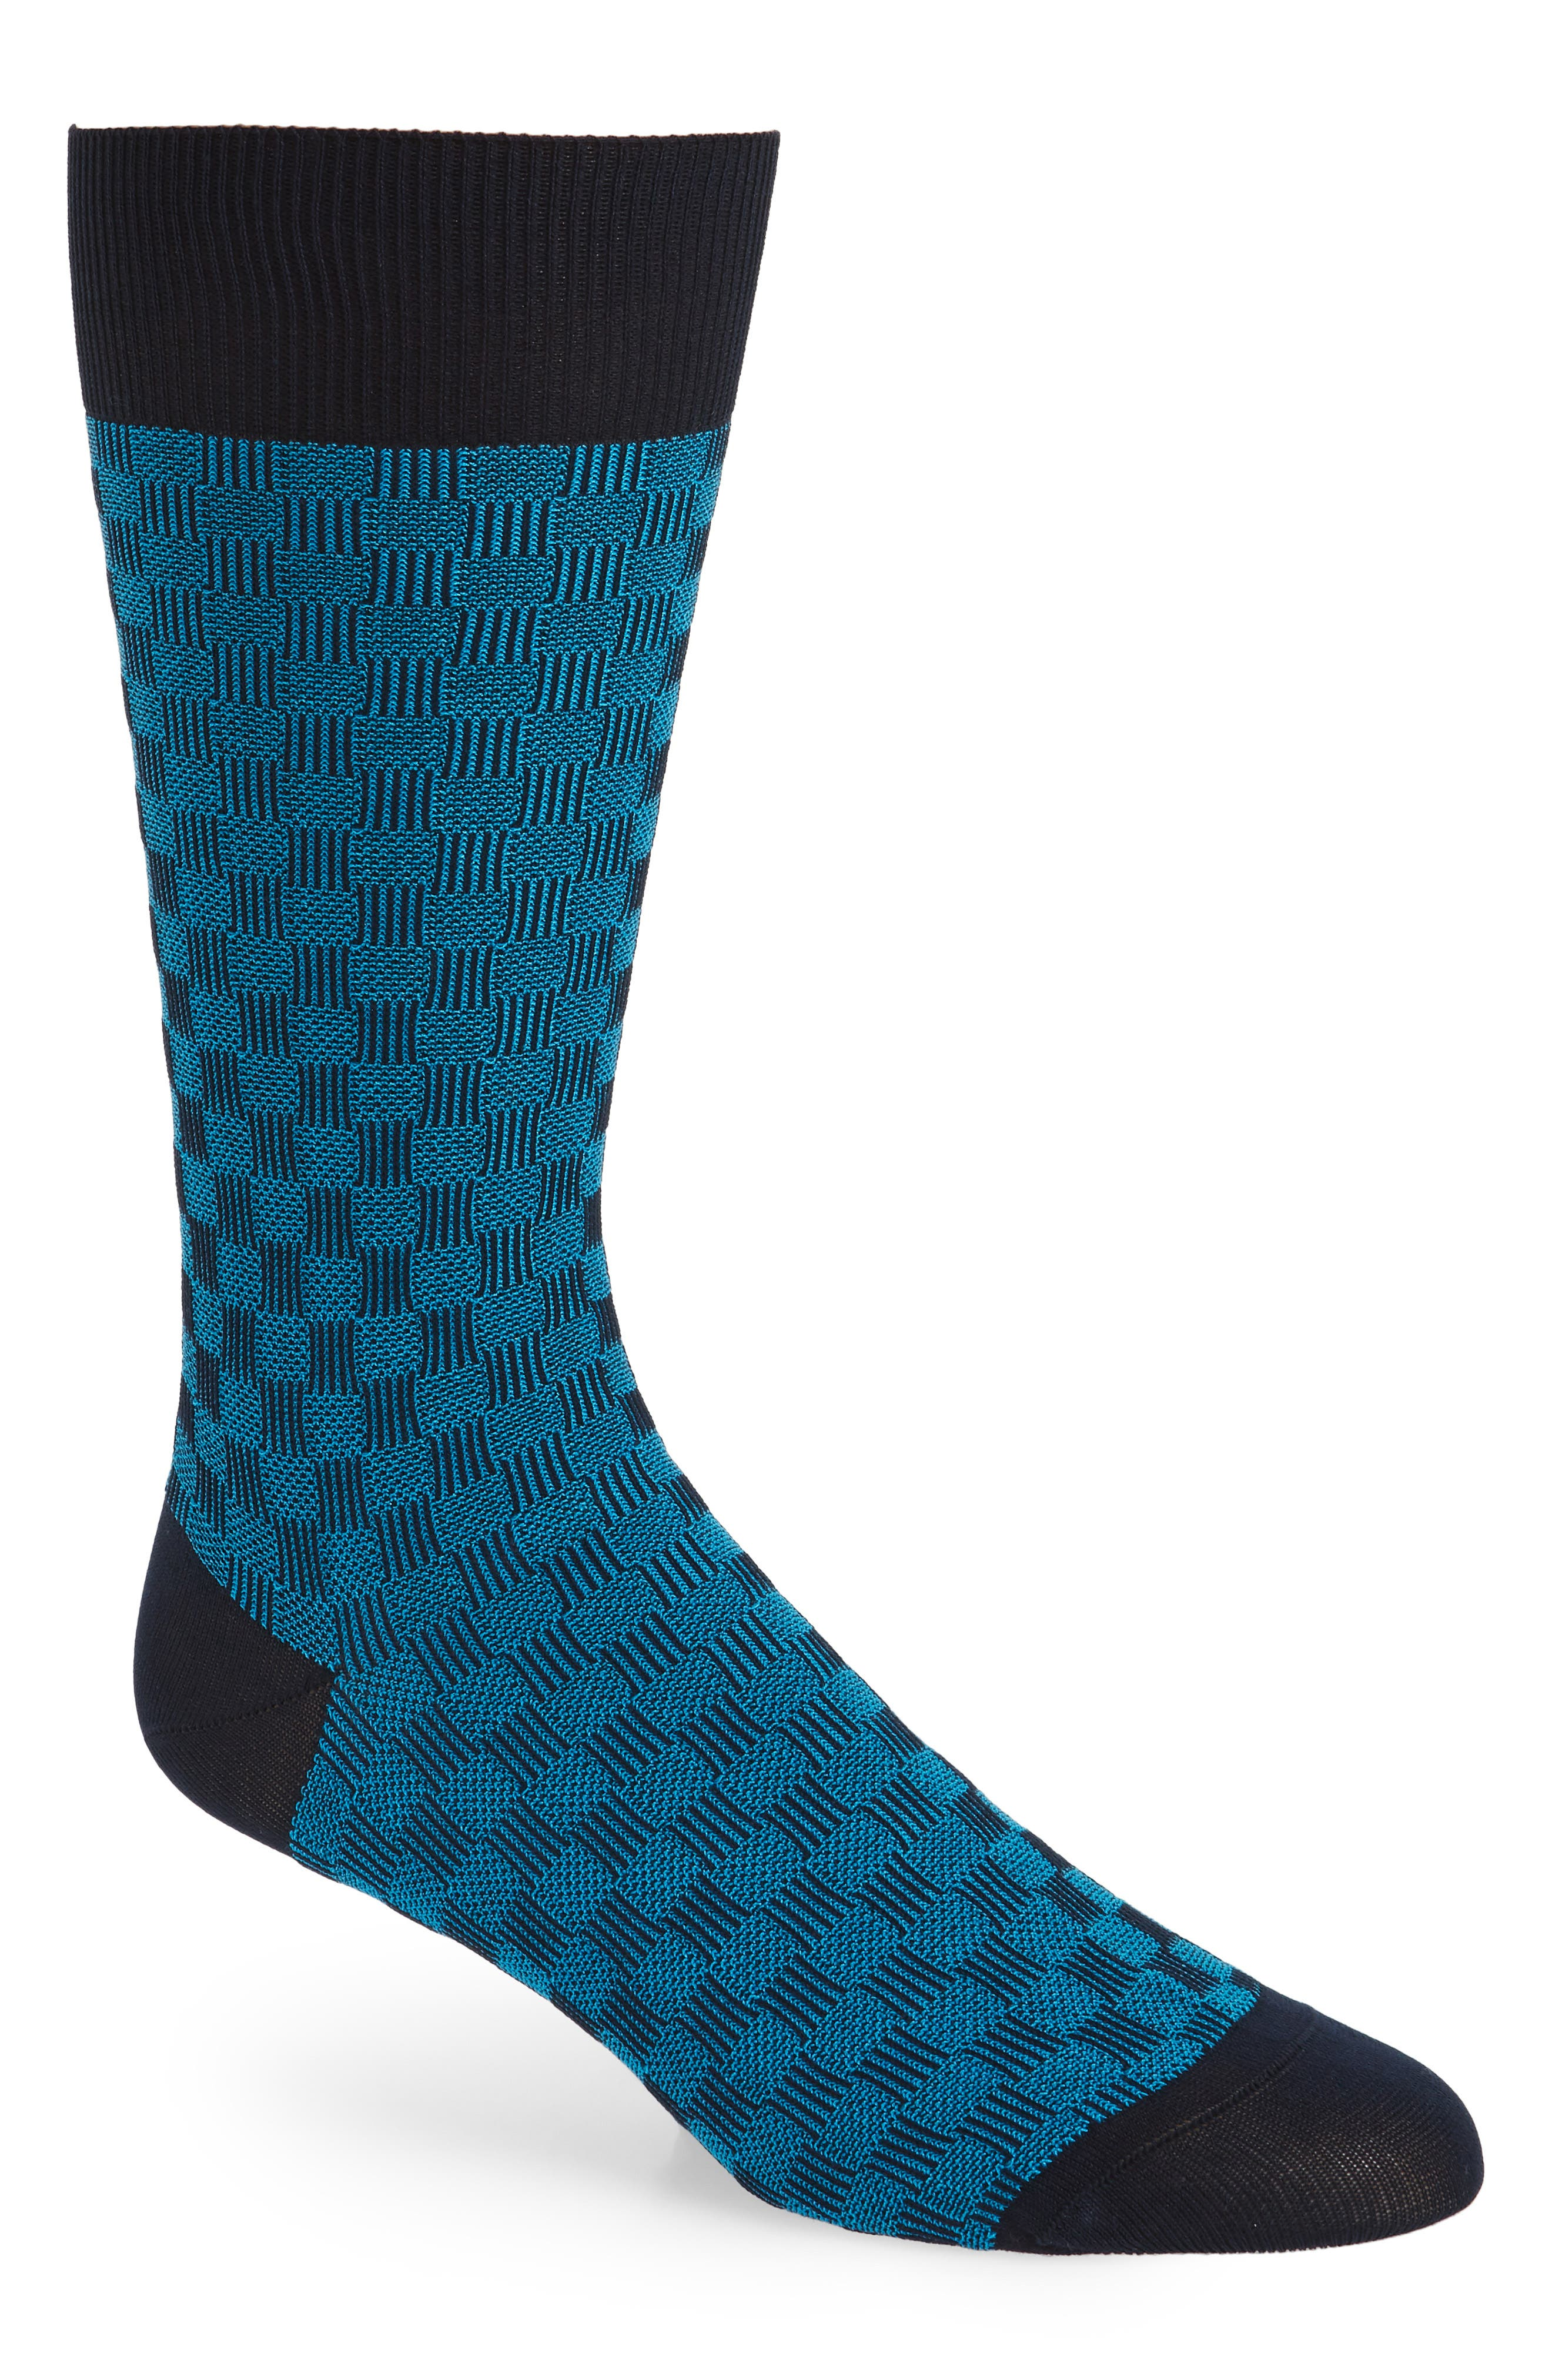 Patchwork Socks,                         Main,                         color, Navy